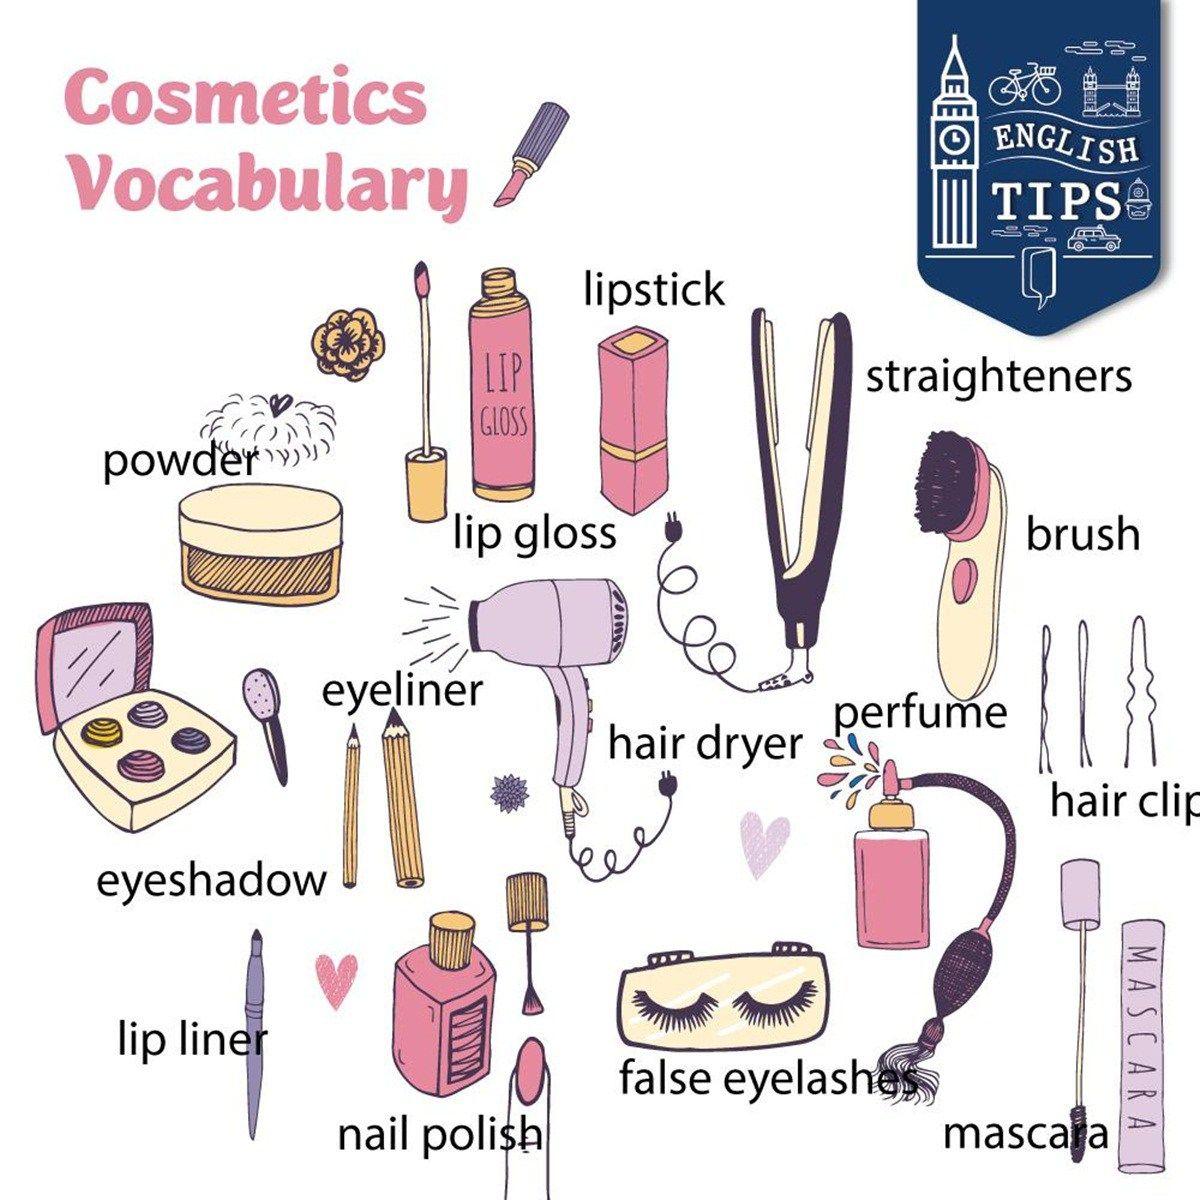 Vocabulary Cosmetics